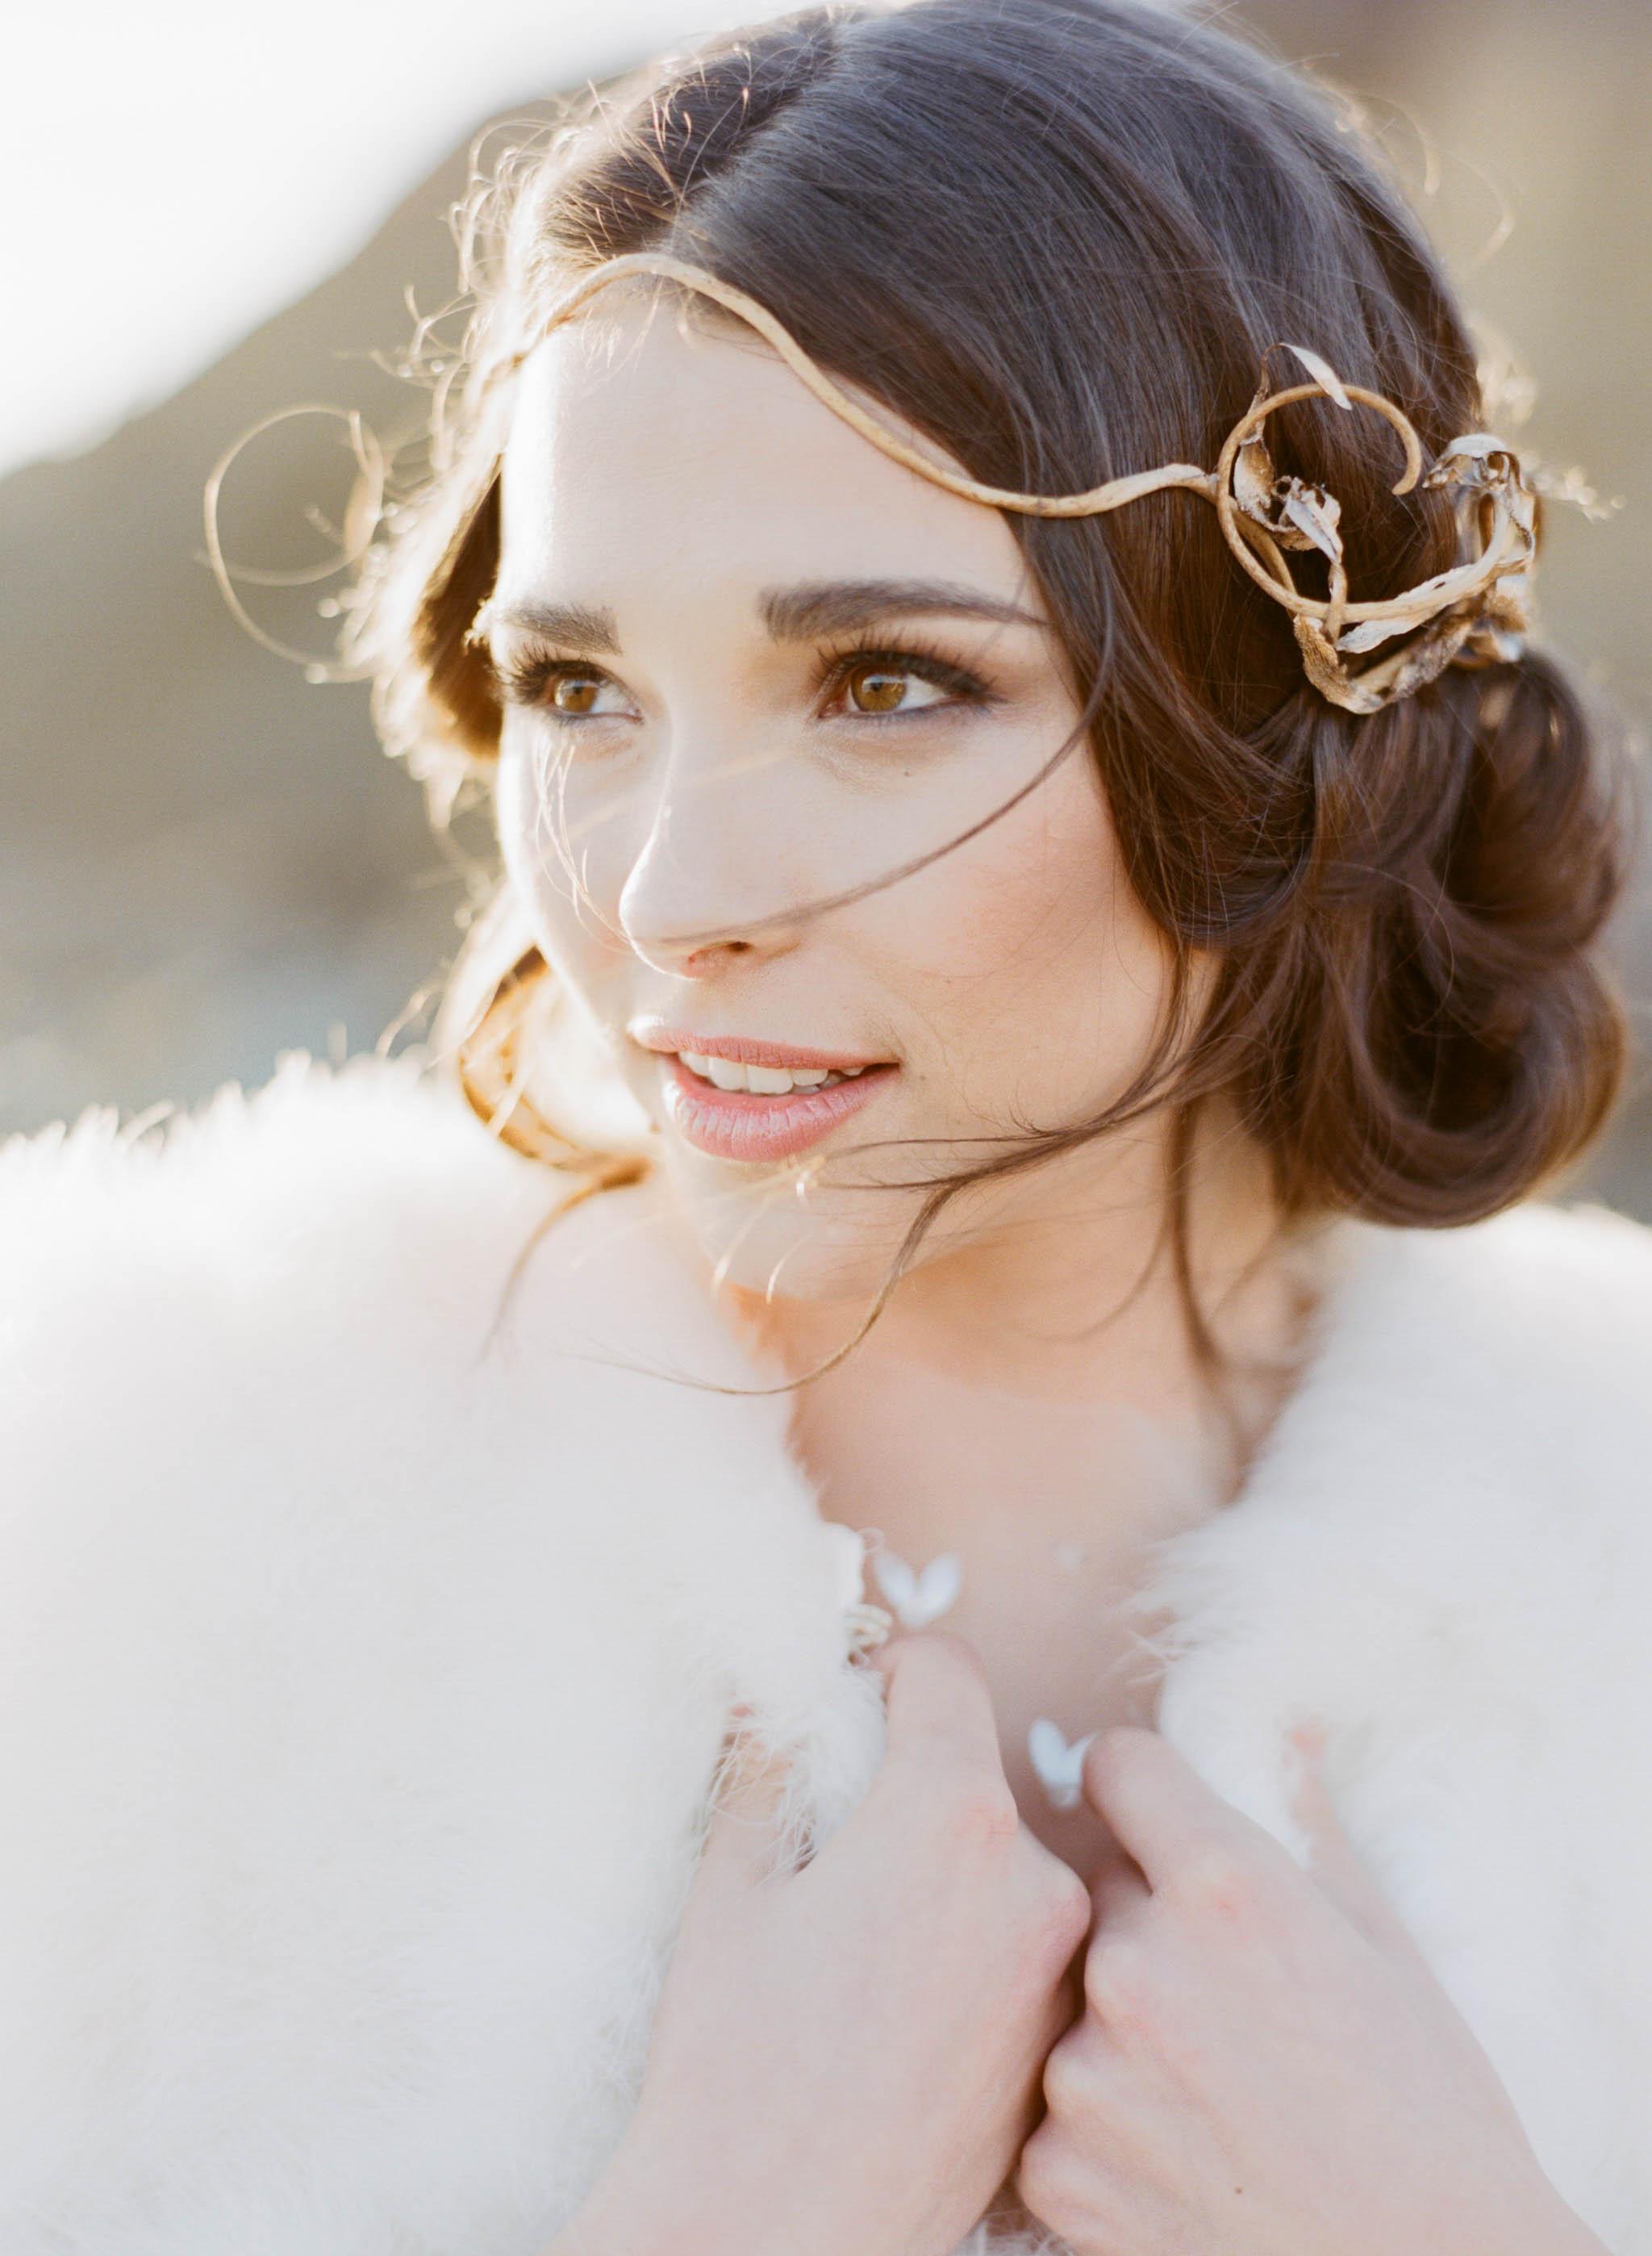 Sylvie-Gil-Beach-Wedding-Golden-Hairpiece-Fur-Coat.jpg